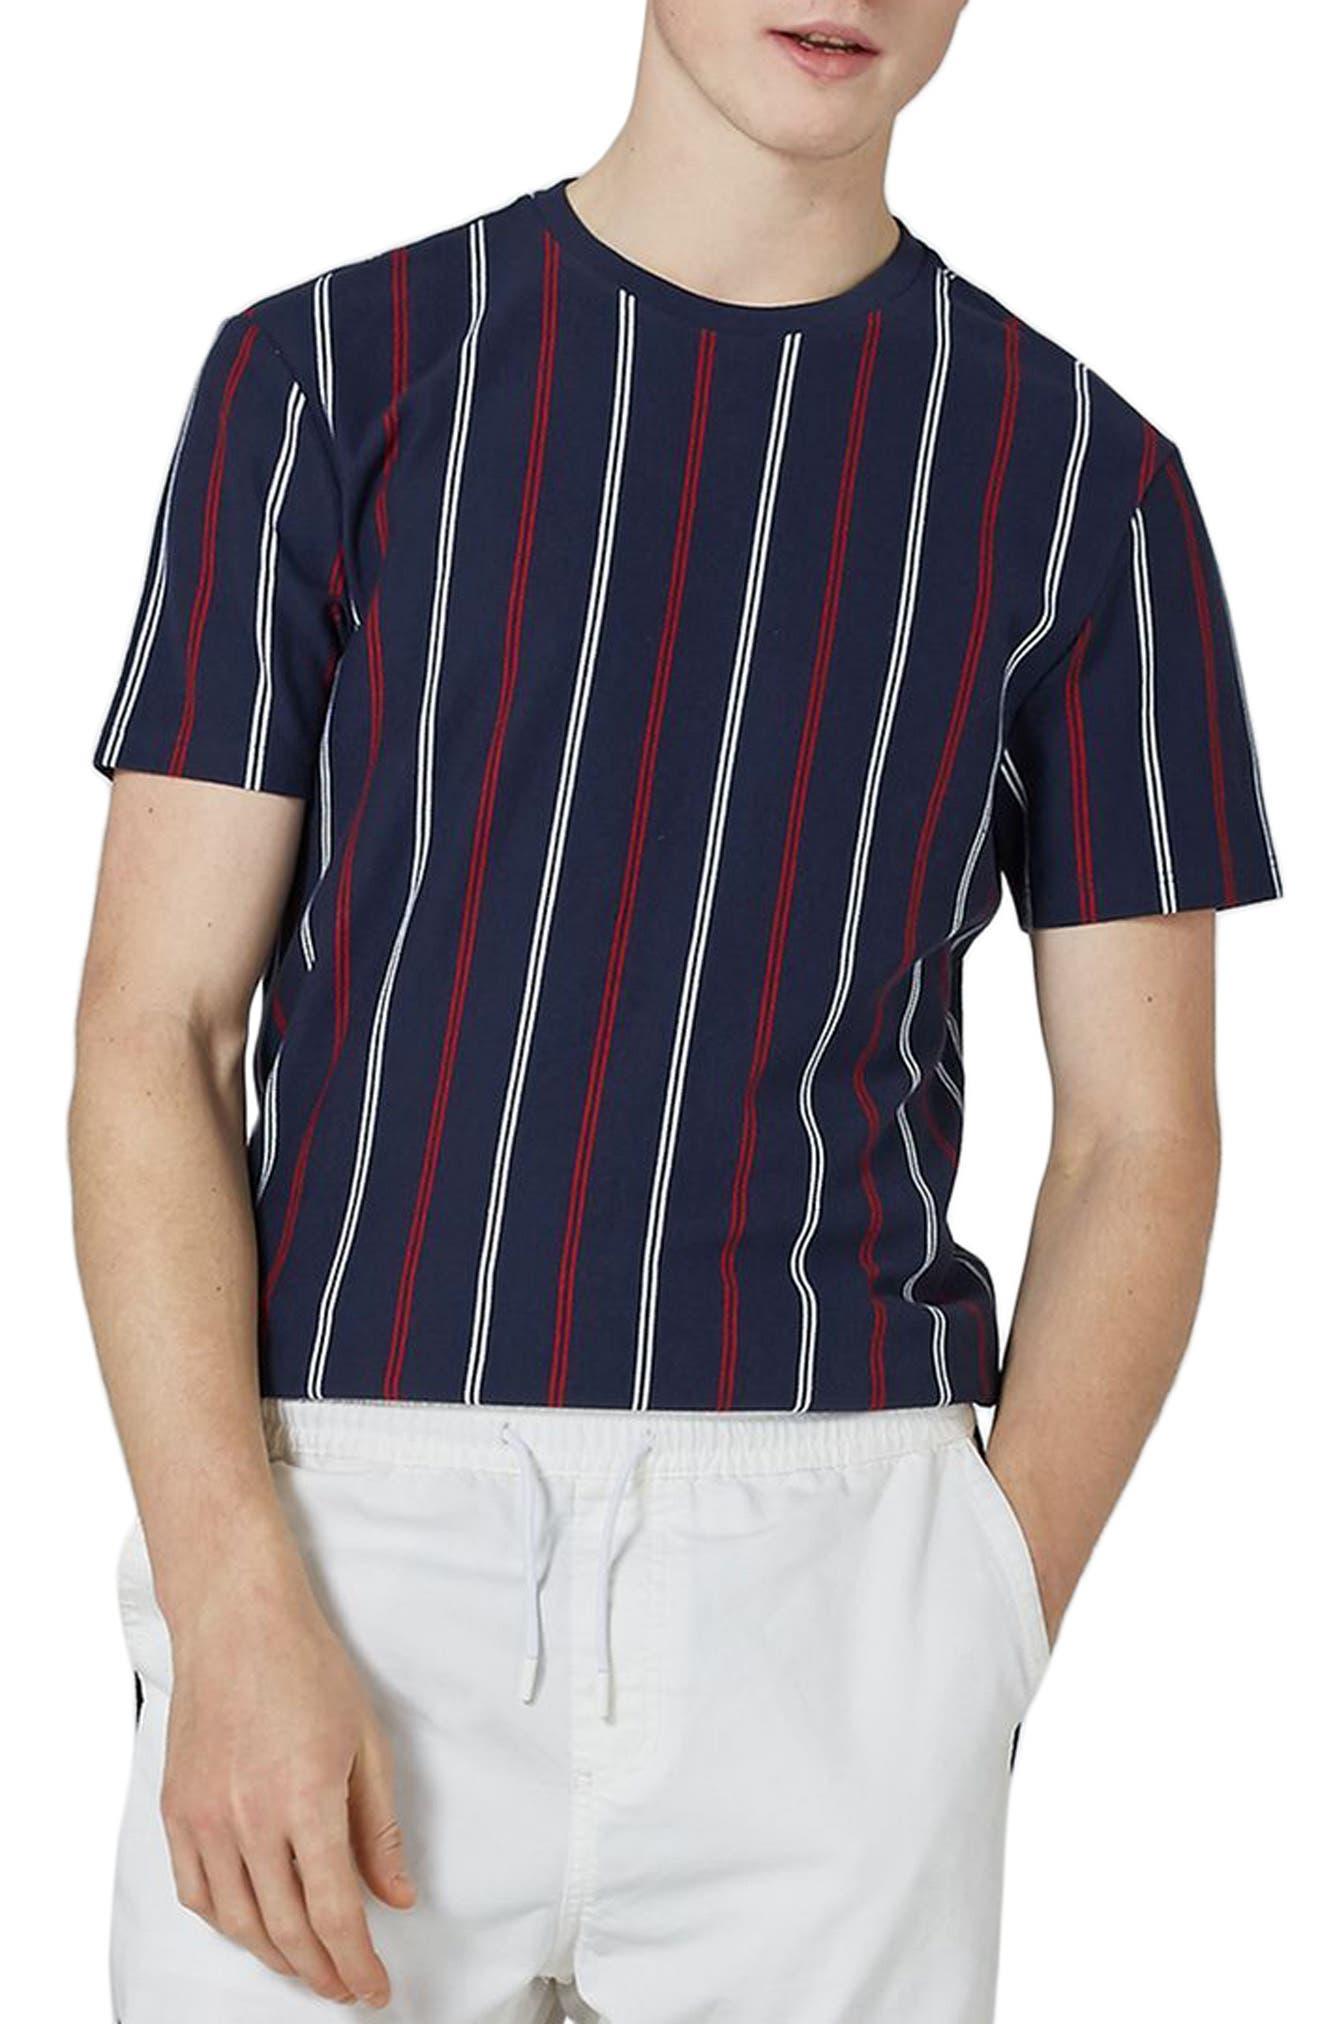 Slim Fit Vertical Striped T-Shirt,                             Main thumbnail 1, color,                             Dark Blue Multi